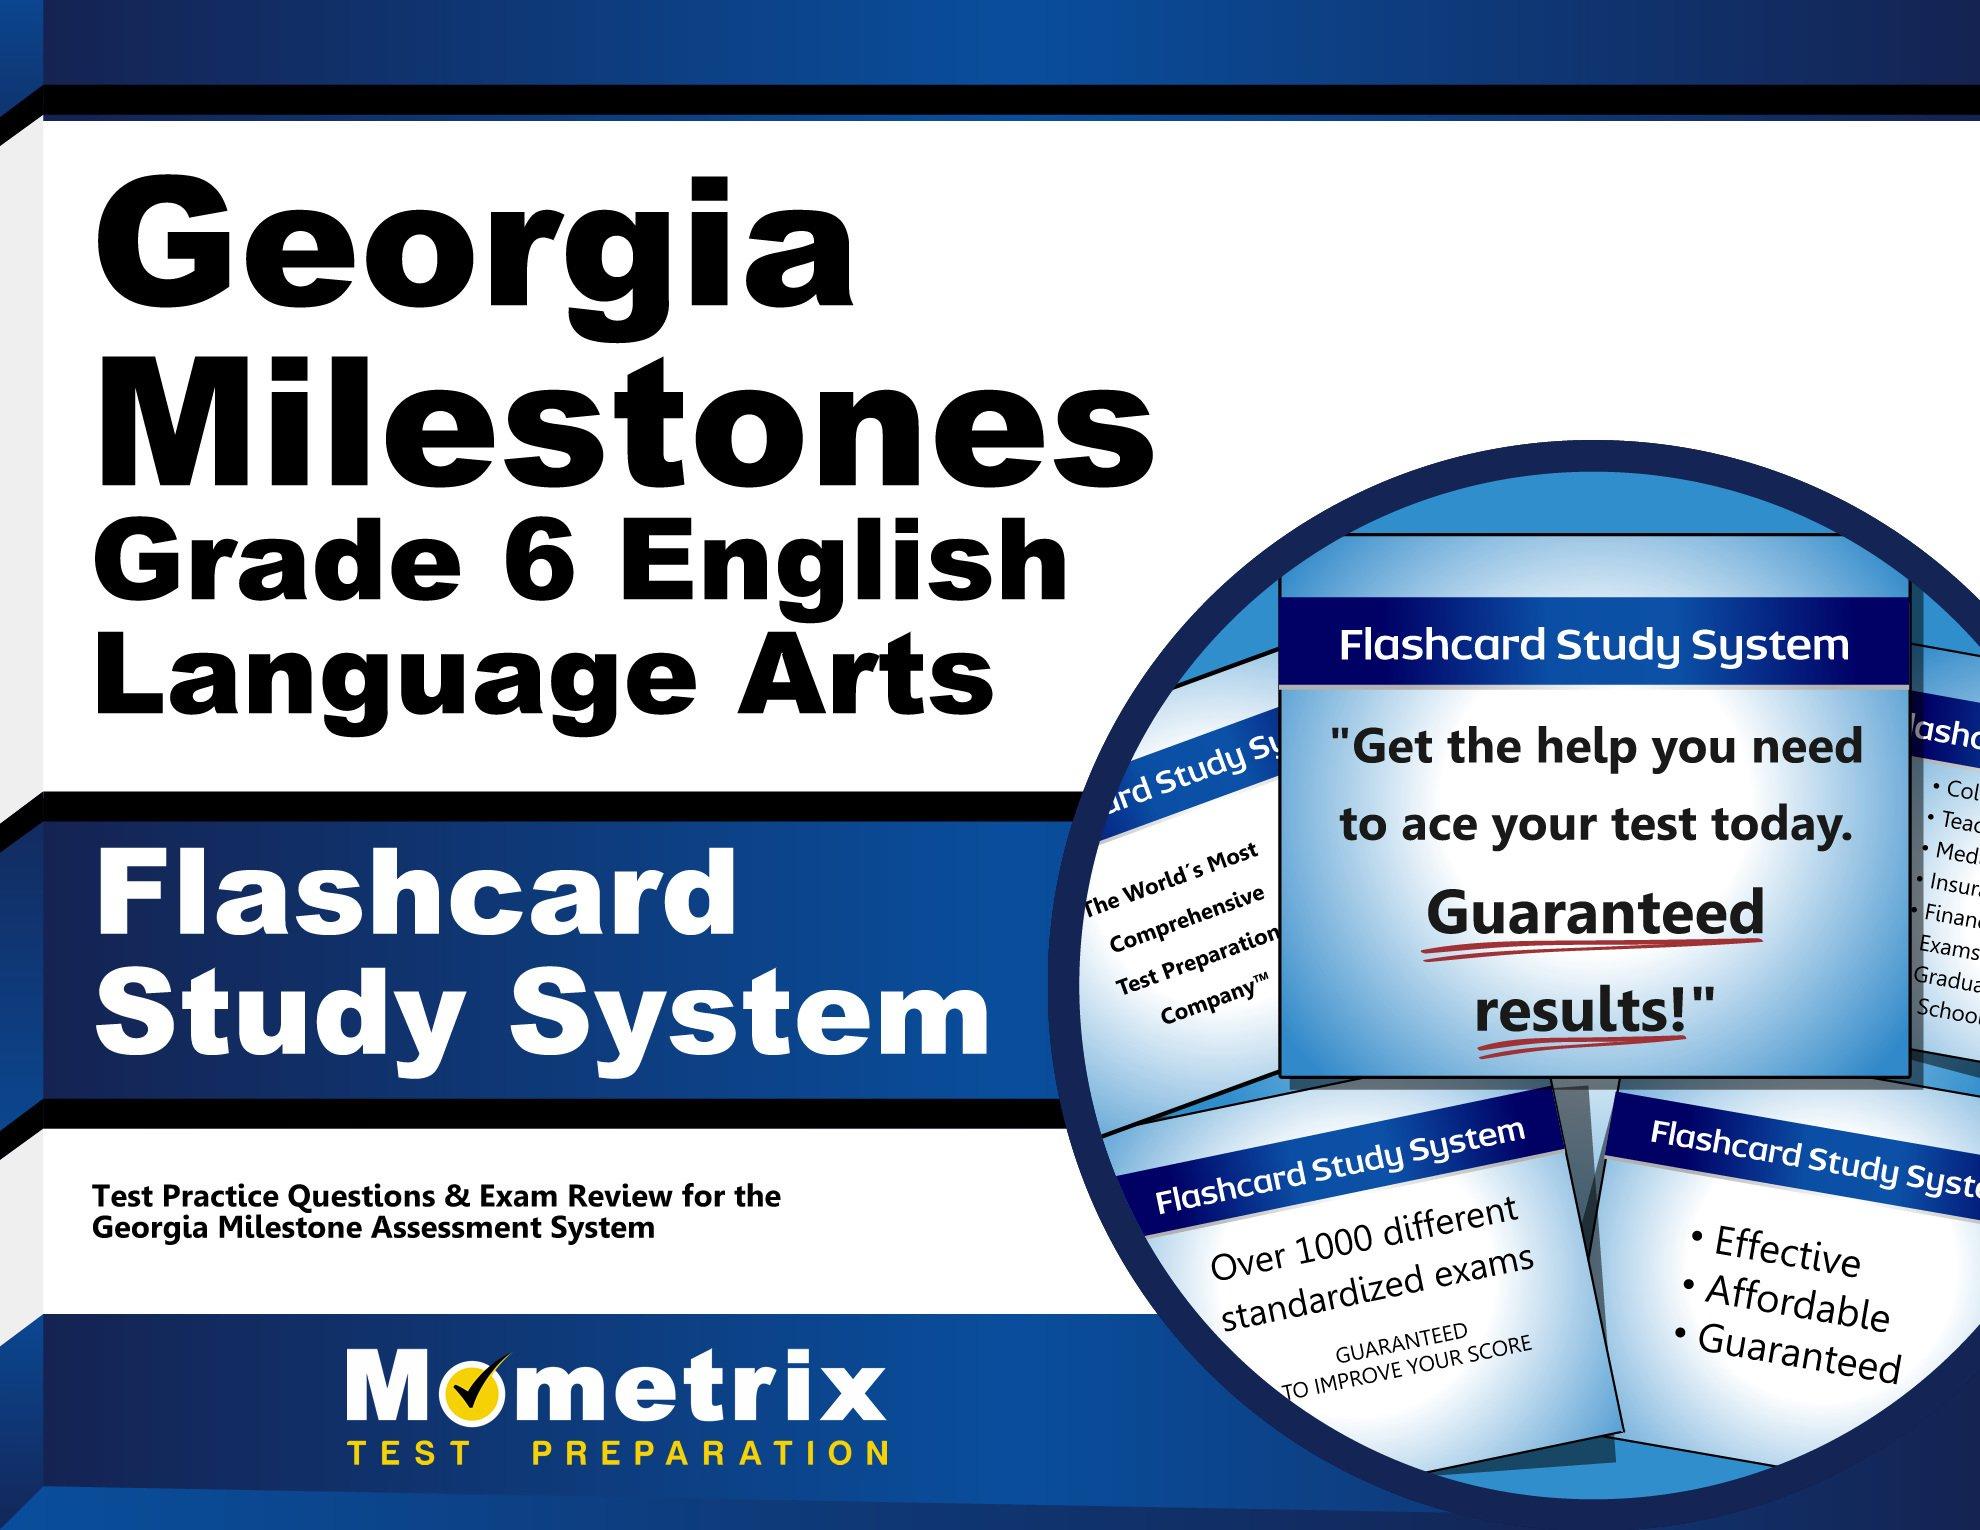 Georgia Milestones Grade 6 English Language Arts Flashcard Study System: Georgia Milestones Test Practice Questions & Exam Review for the Georgia Milestones Assessment System (Cards)